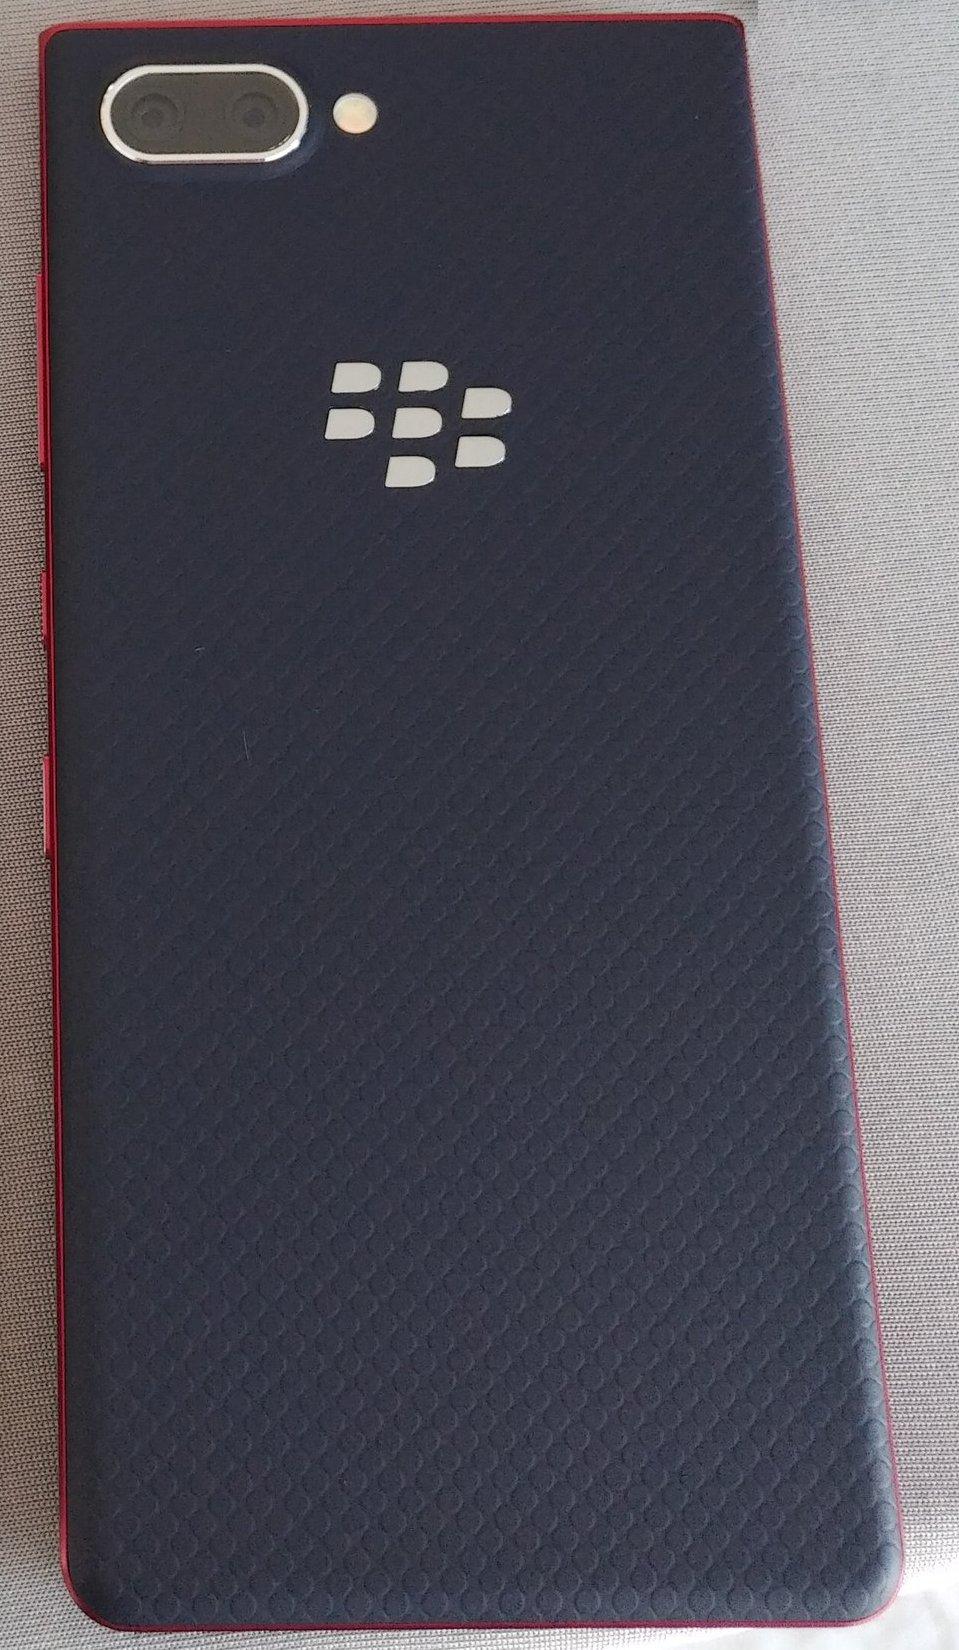 KEY2 от BlackBerry получит Lite-версию